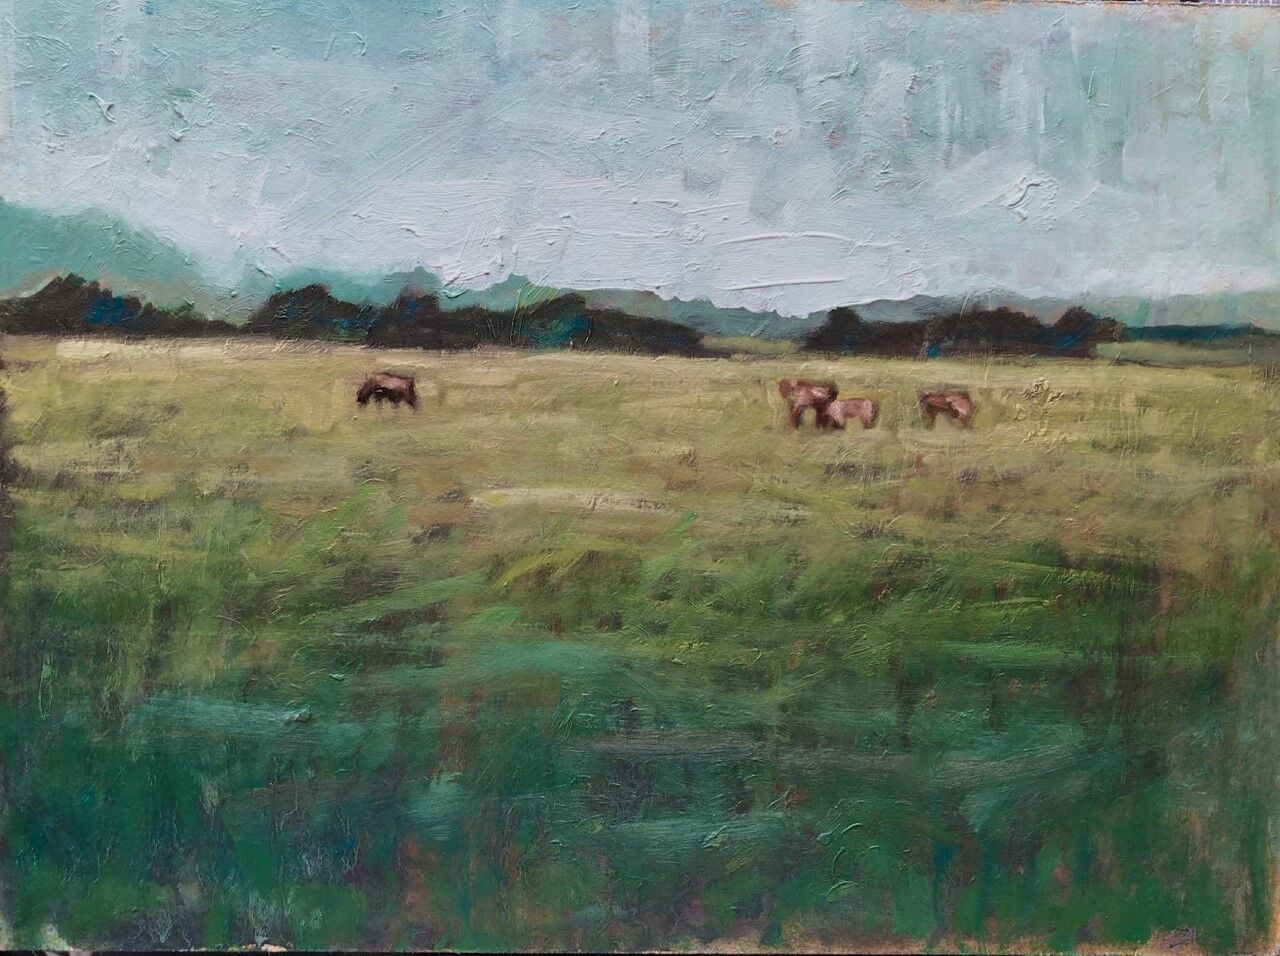 Farm animals in a field